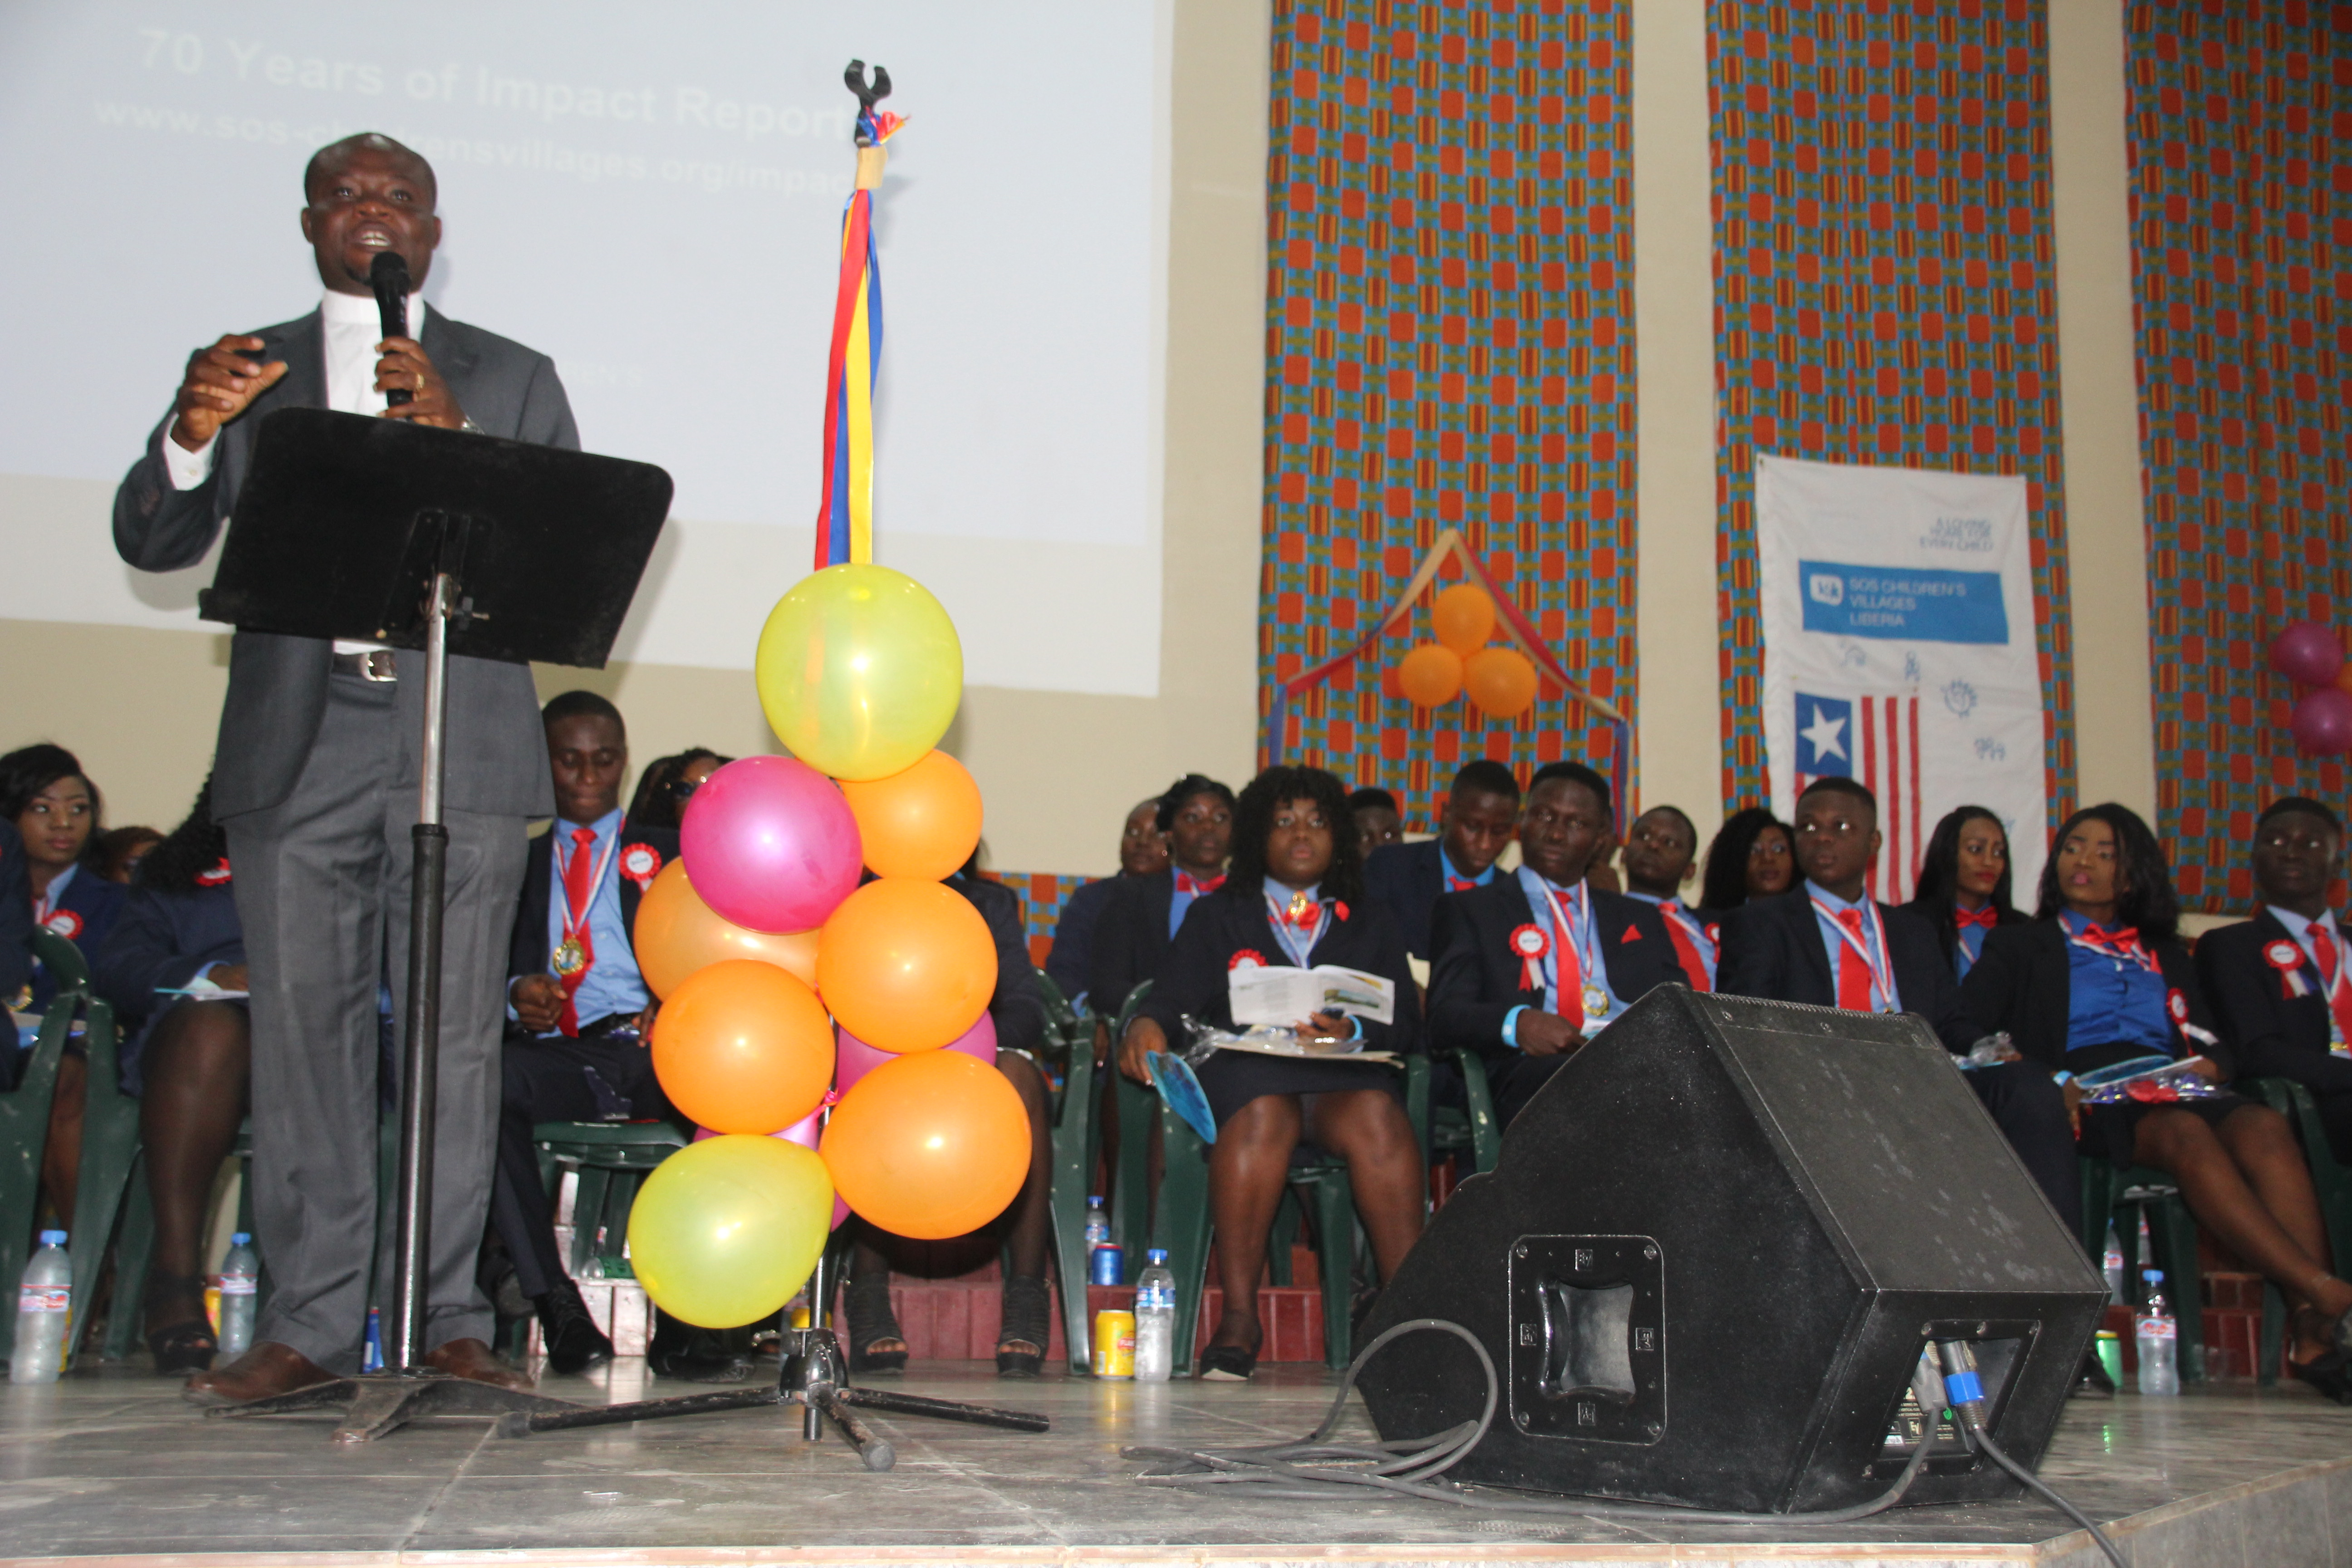 SOS Liberia HGIS Monrovia Graduates 26 students: Guest Speaker, cautioned graduates not to lose sight of the future